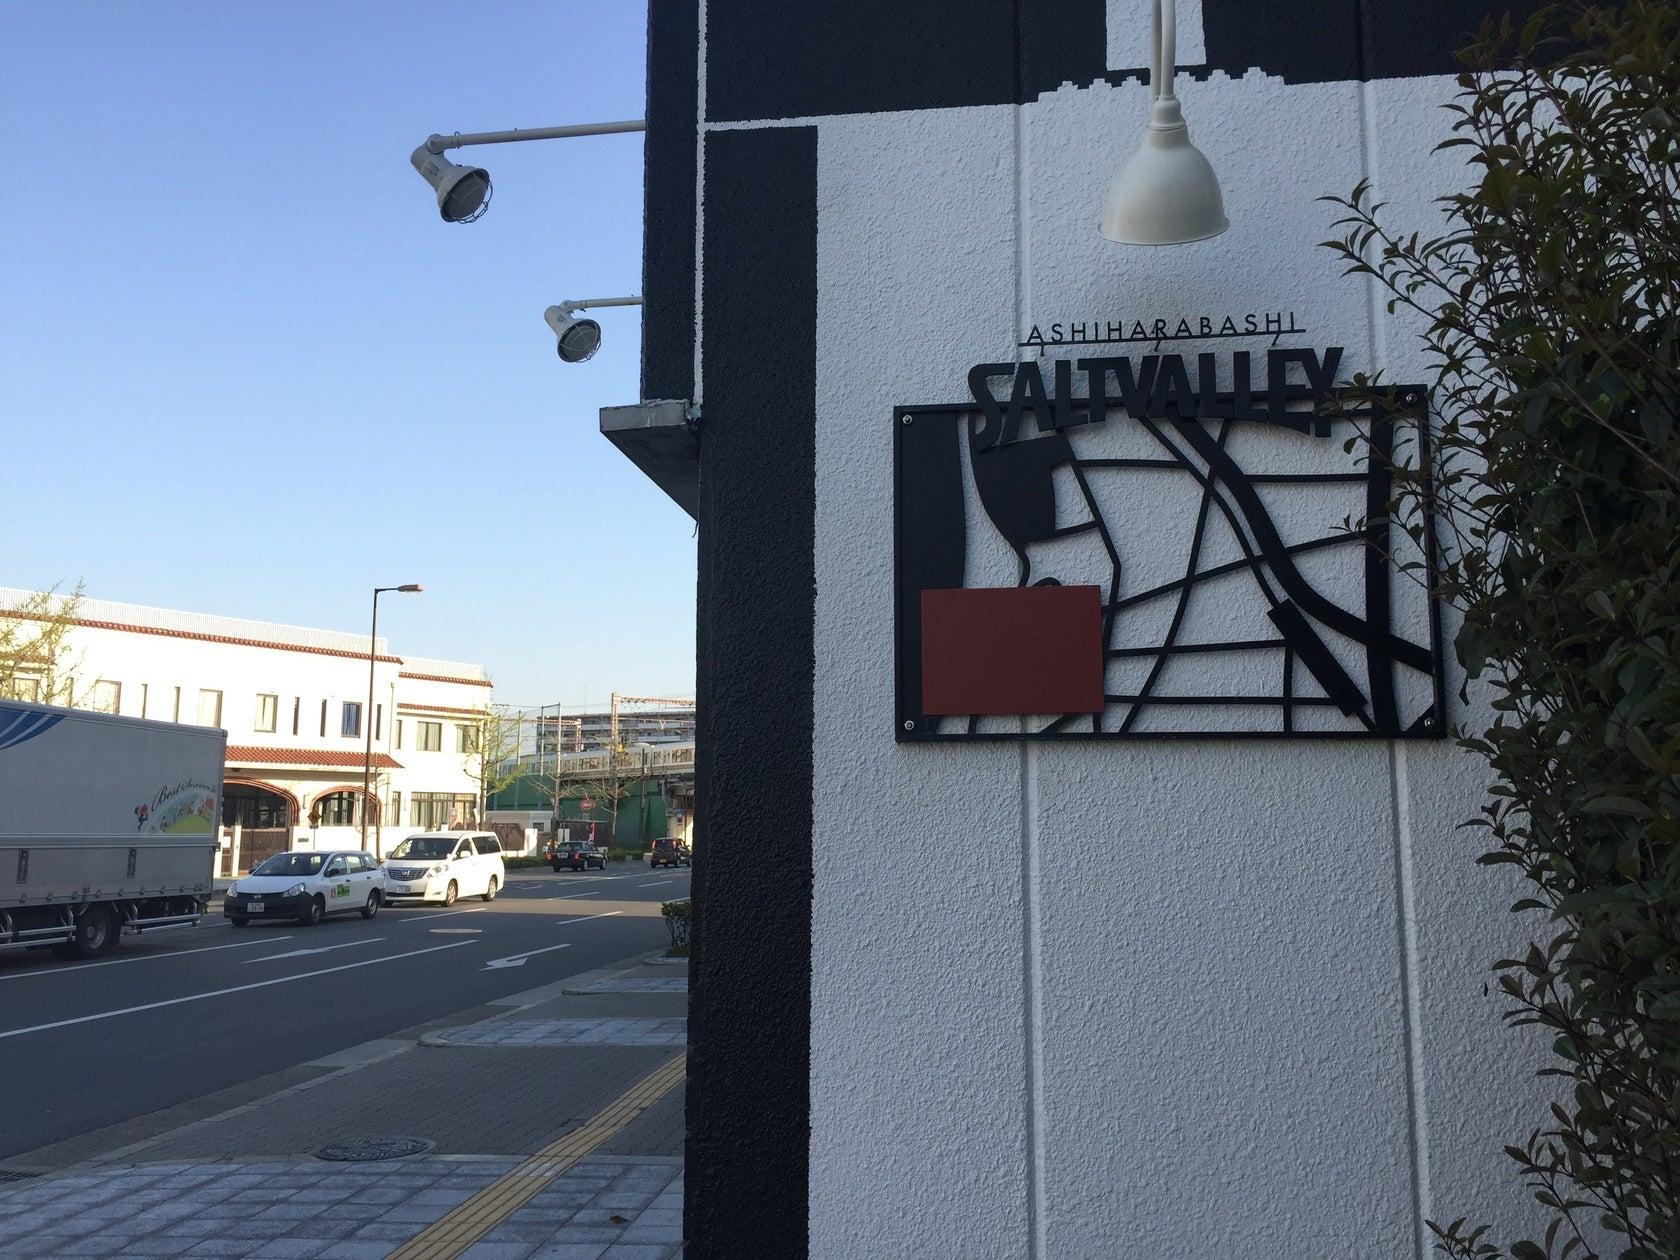 JR大阪環状線「芦原橋駅」1分まるまる貸切!ボタニカルガーデン利用可 のサムネイル